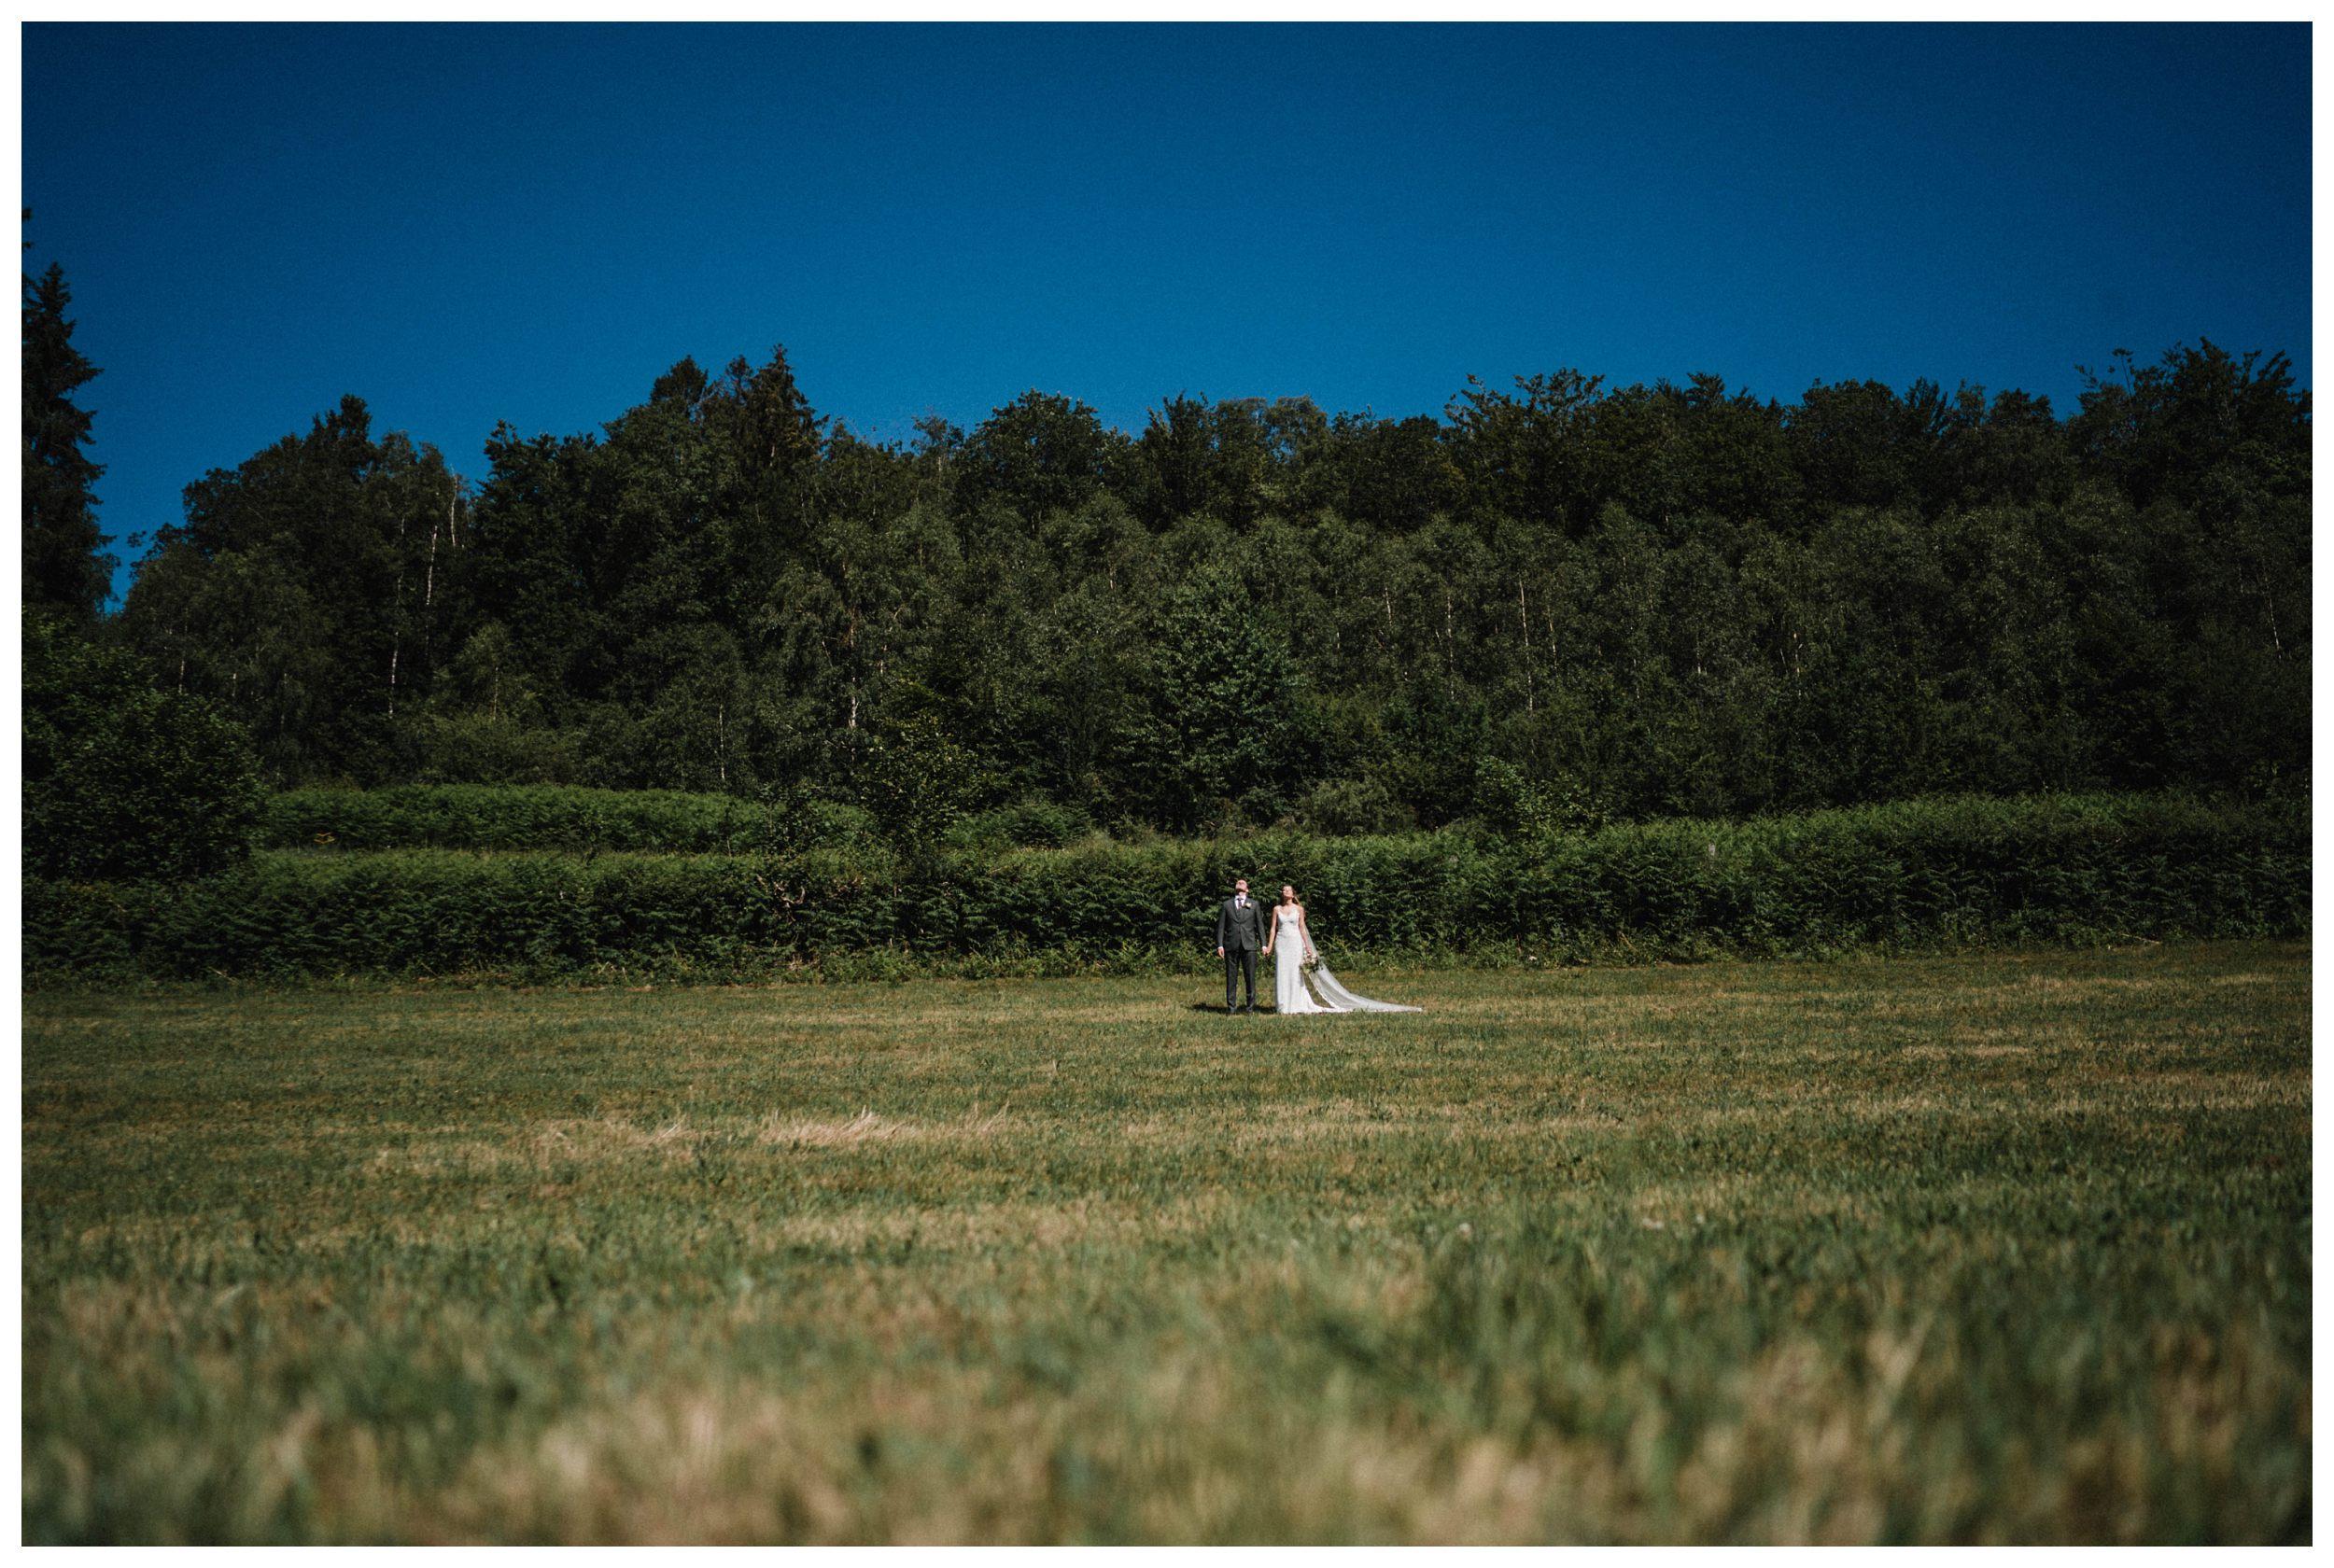 huwelijksfotograaf bruidsfotograaf destinationwedding huwelijksfotografie in ardennen nederland (43).jpg